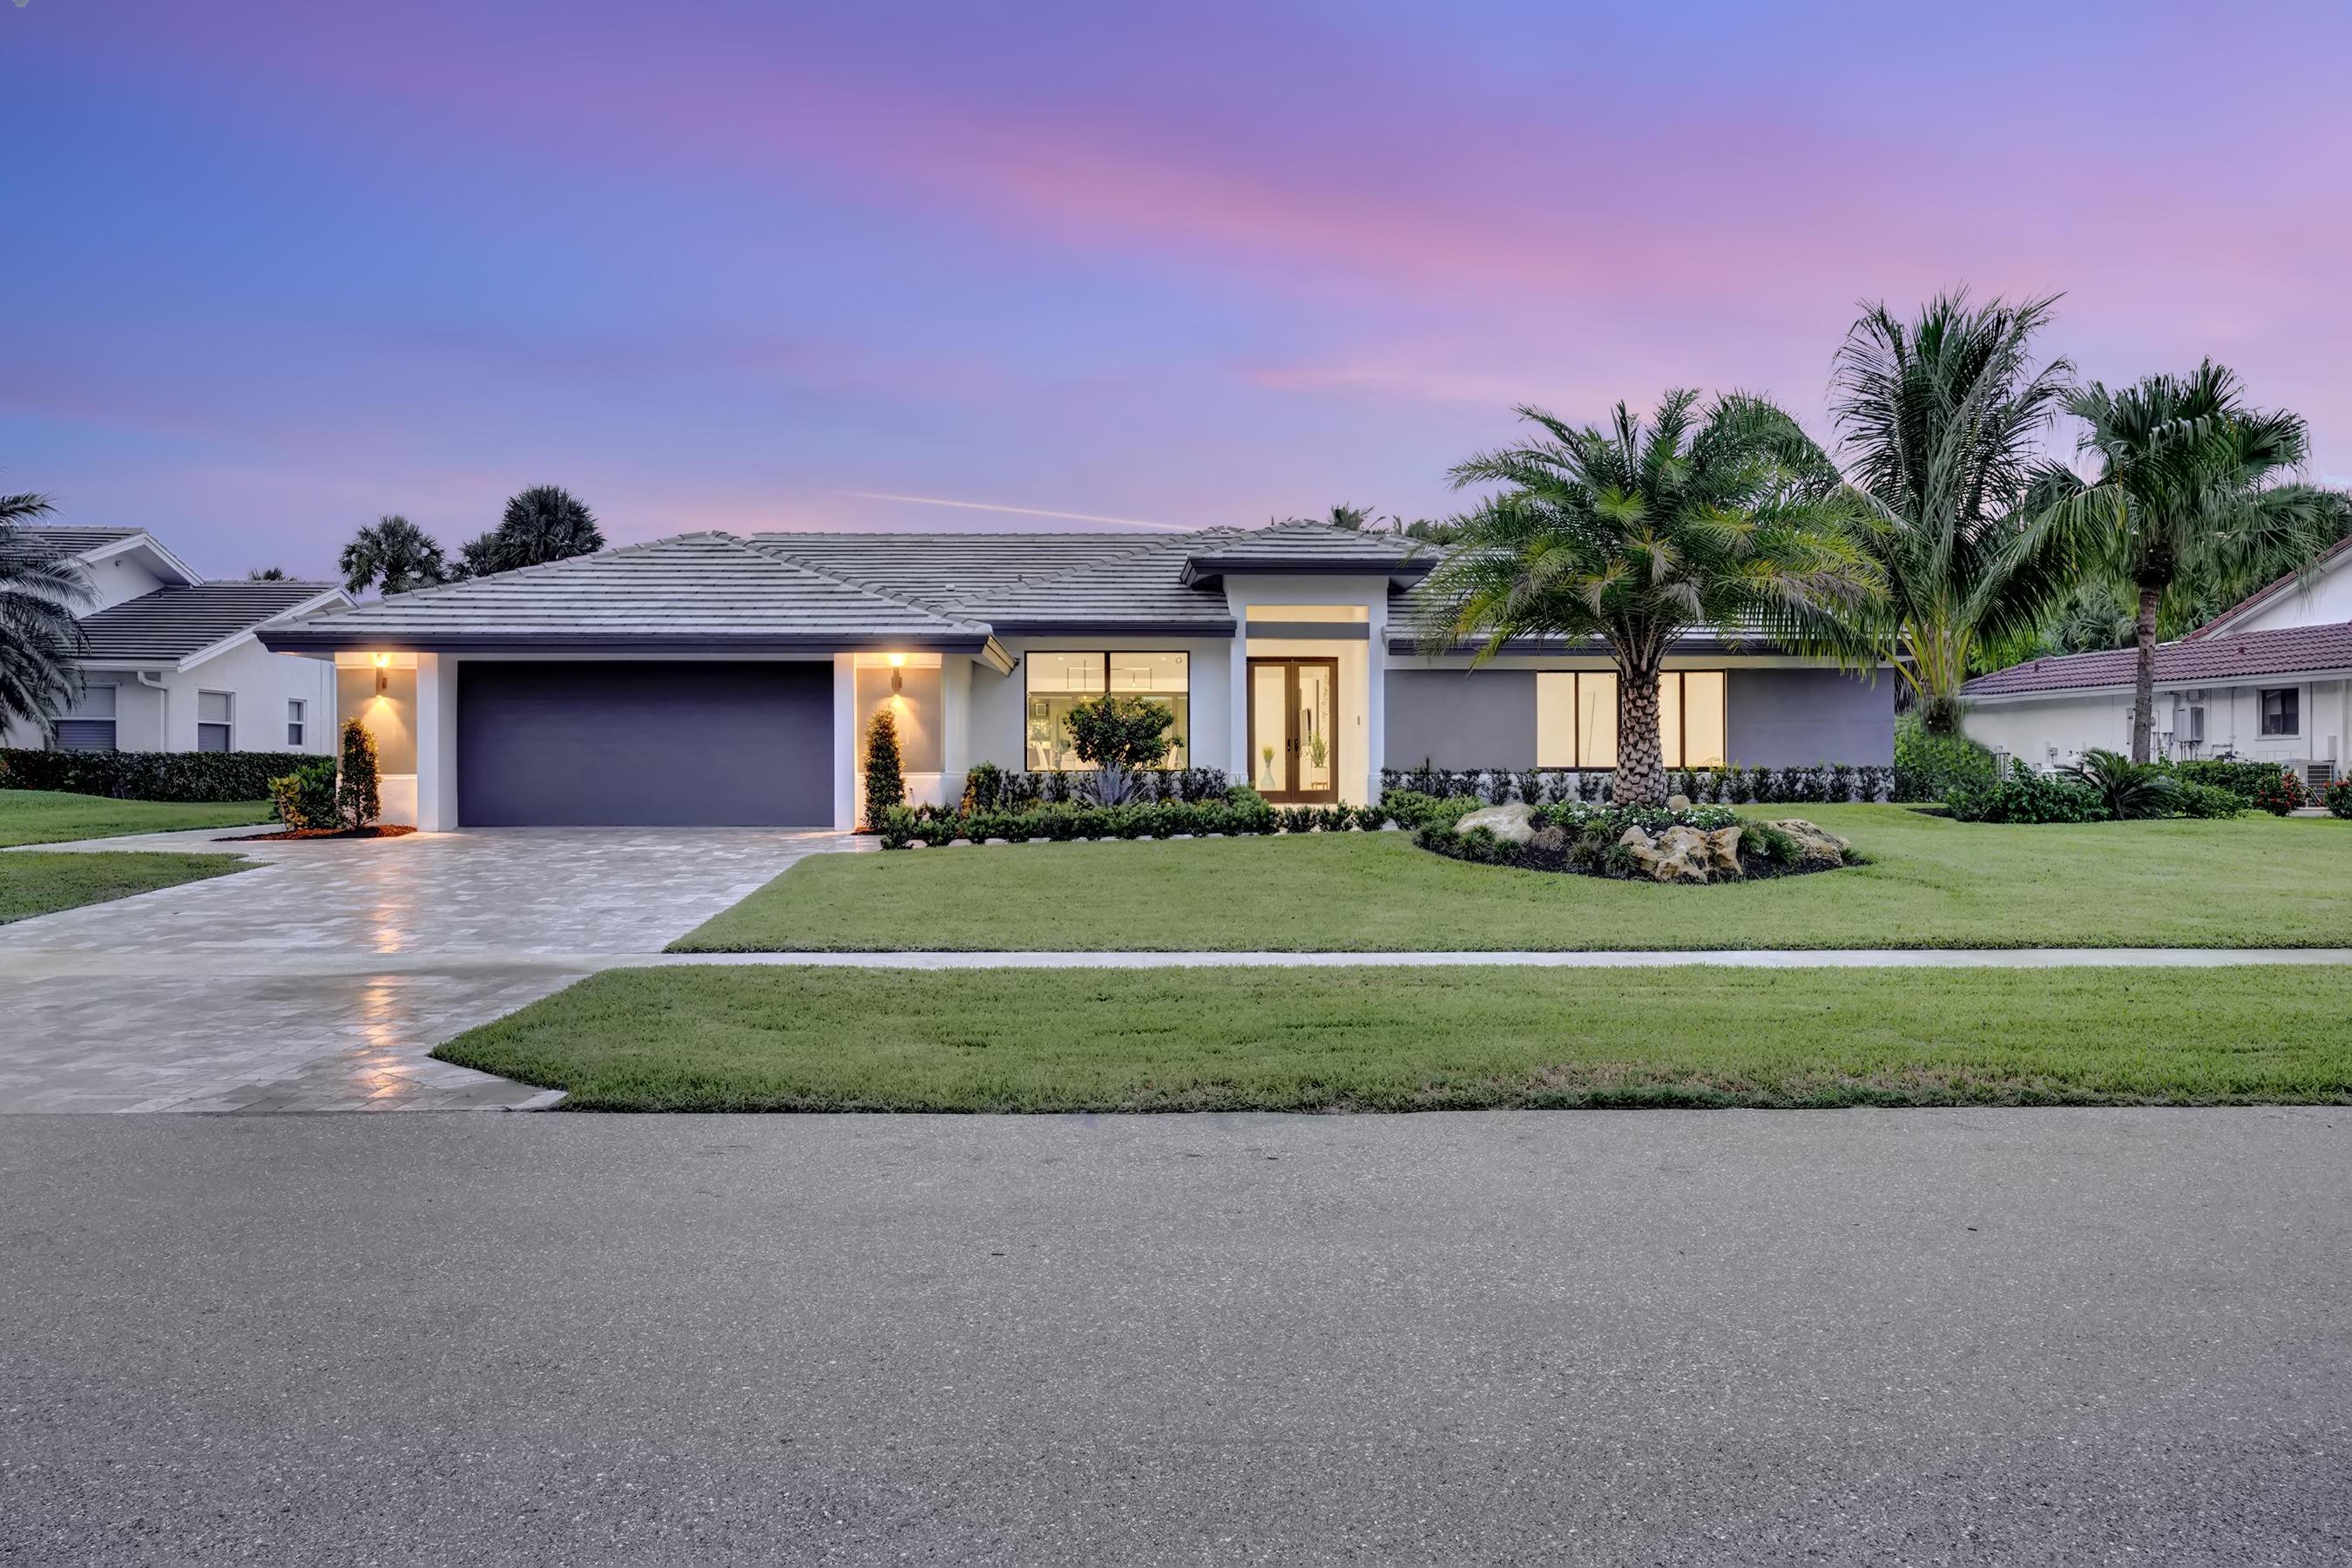 Photo of 4657 Tree Fern Drive, Delray Beach, FL 33445